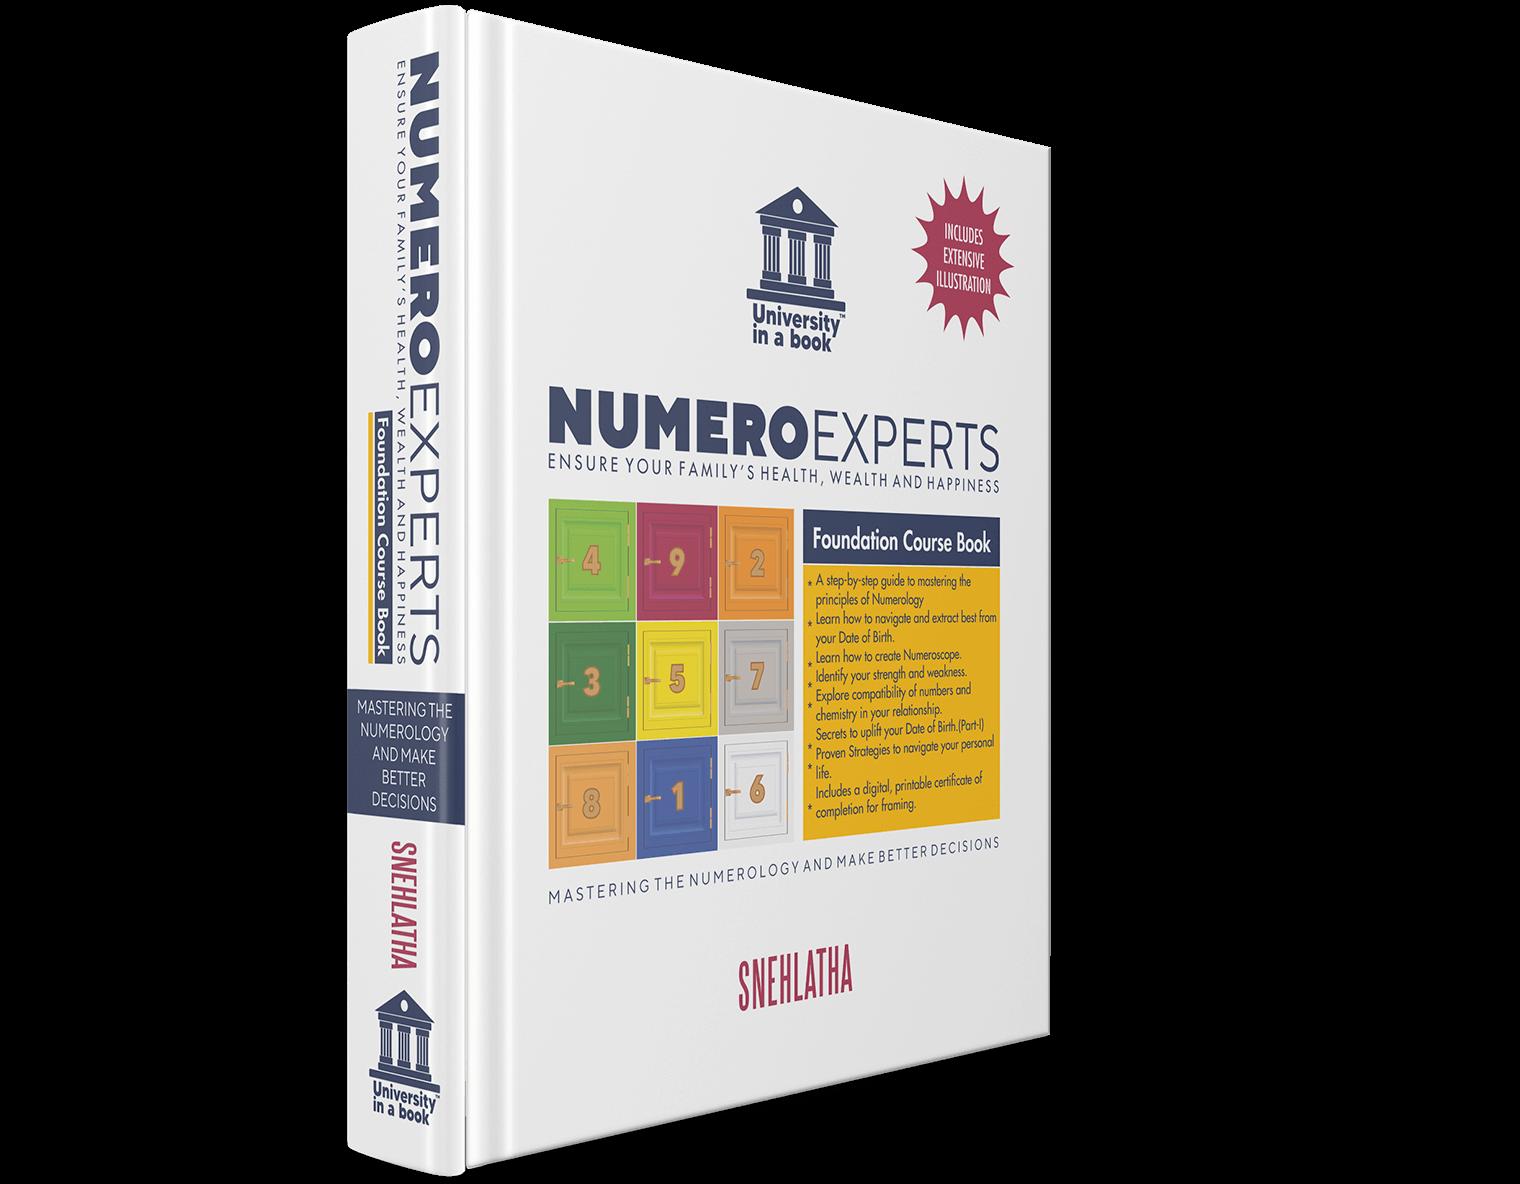 Numeroexperts Foundation Course-Book